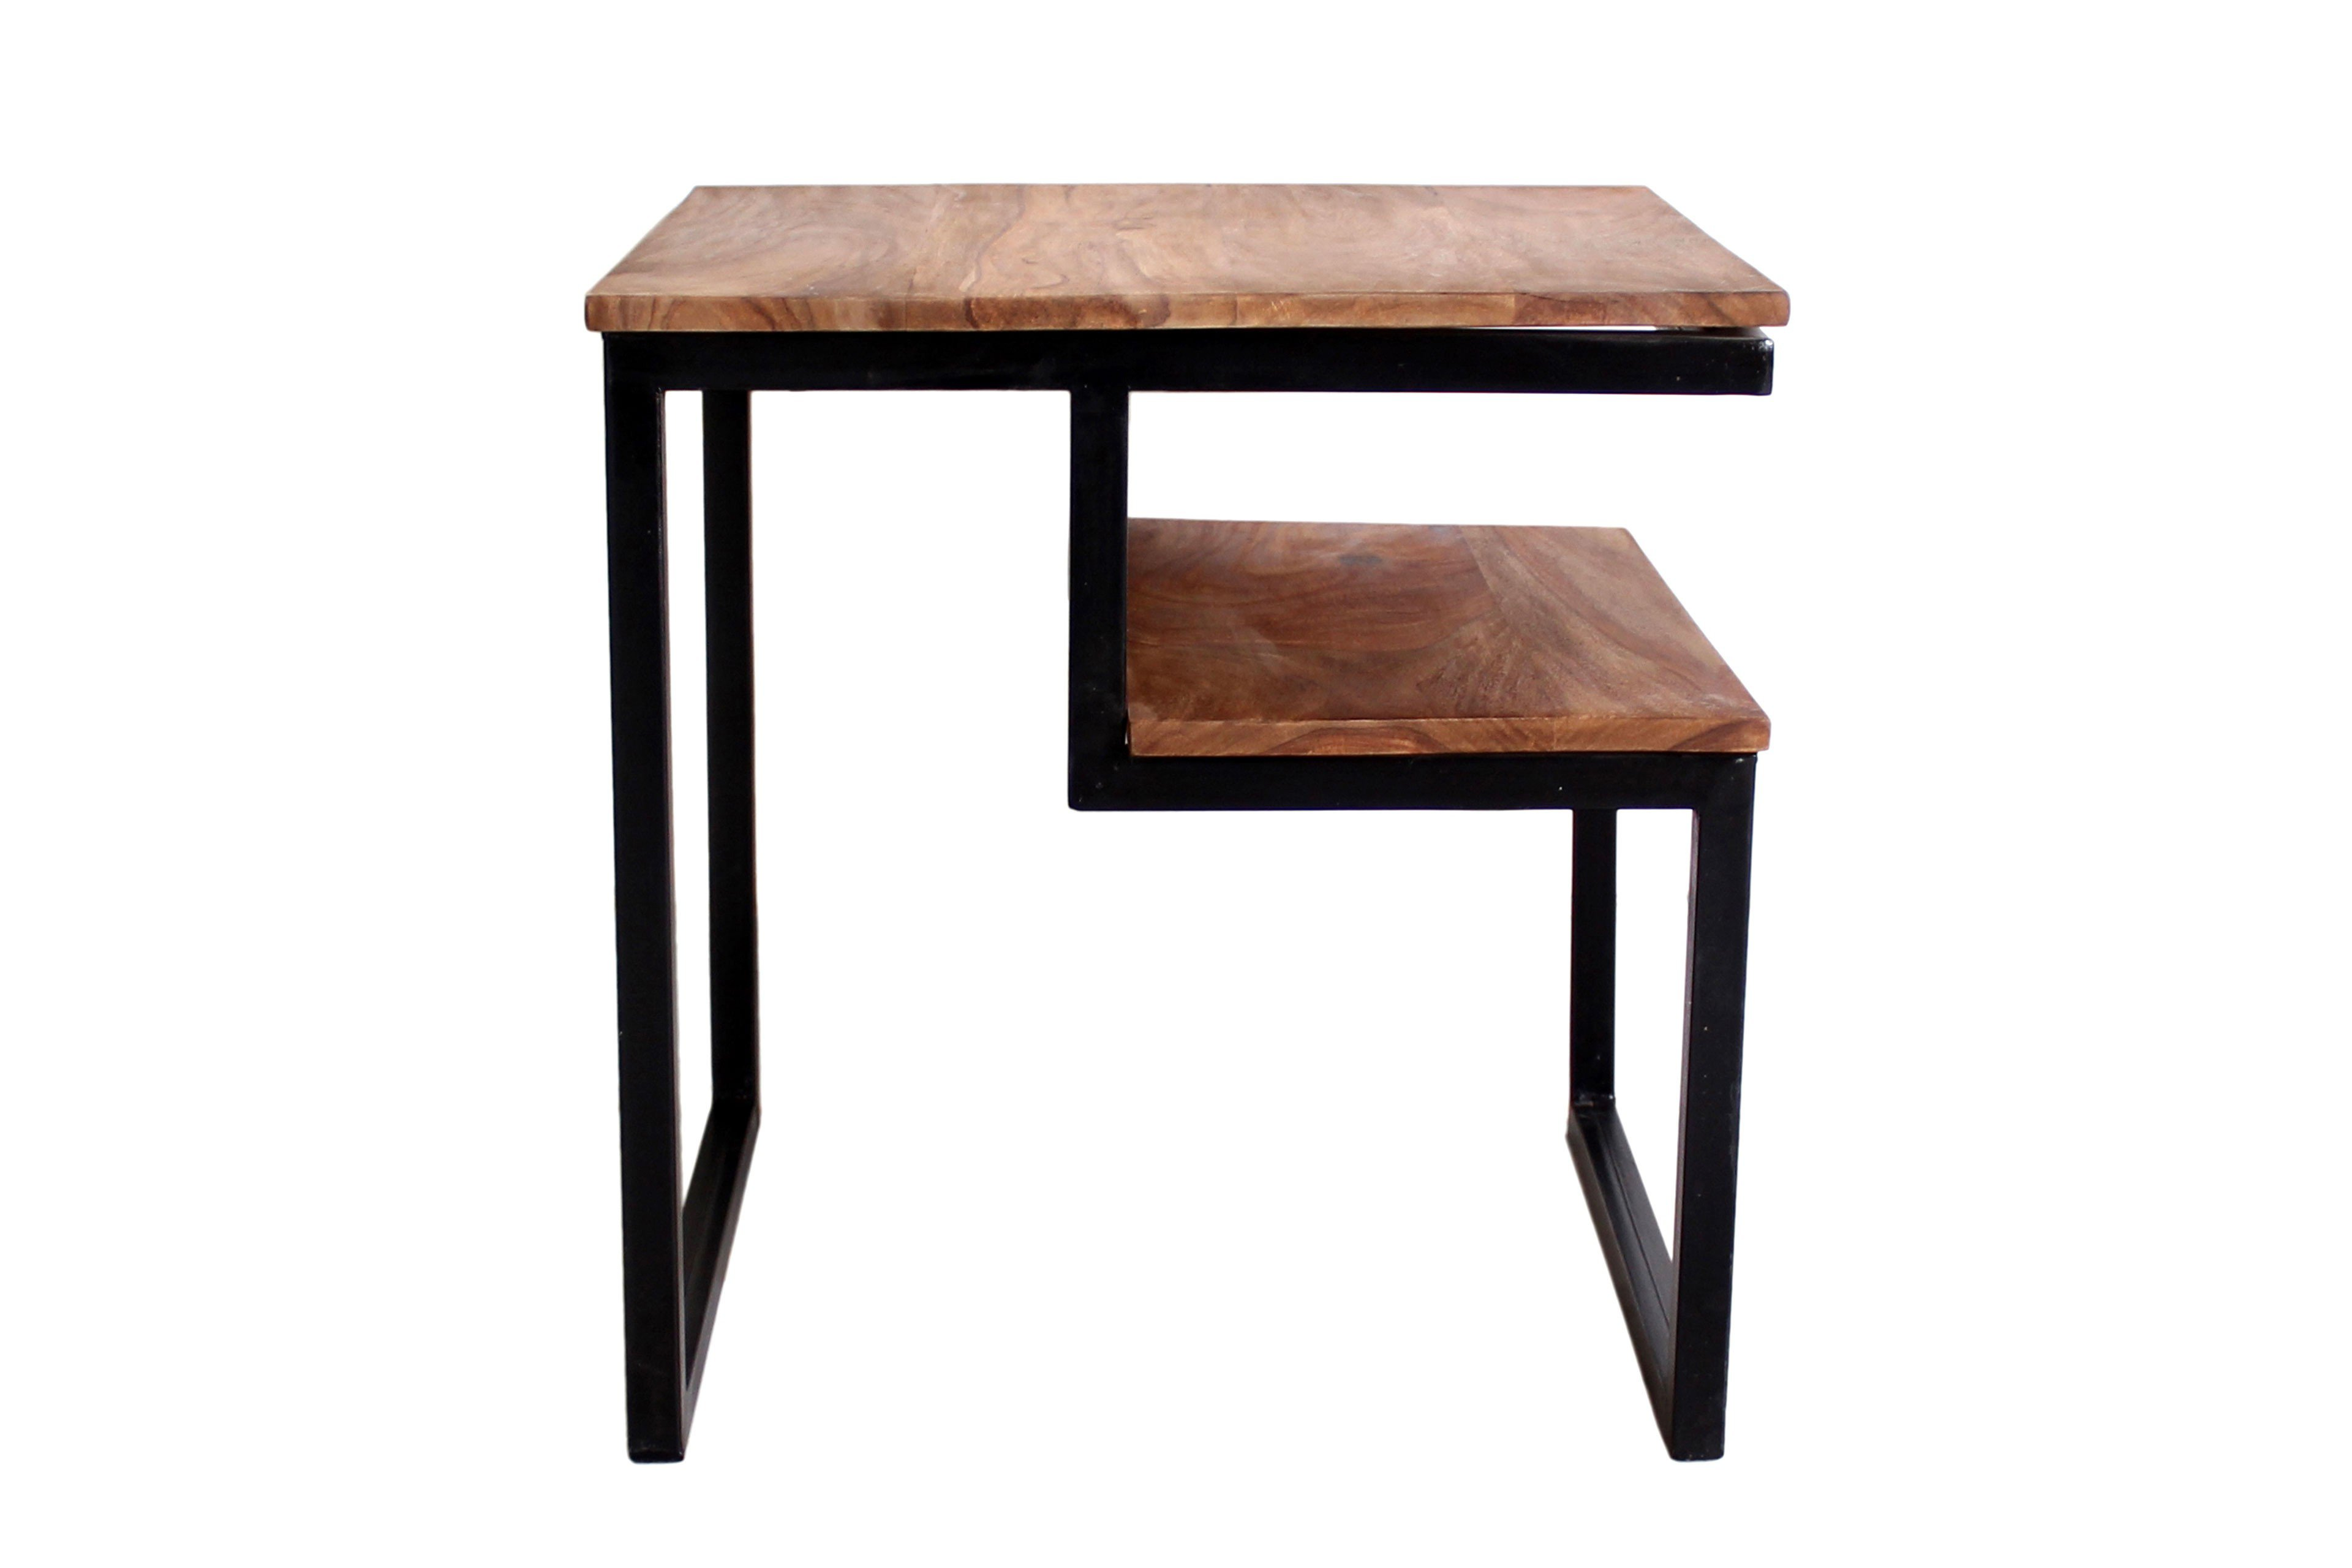 sit m bel regal panama sheesham altmetall m bel letz ihr online shop. Black Bedroom Furniture Sets. Home Design Ideas